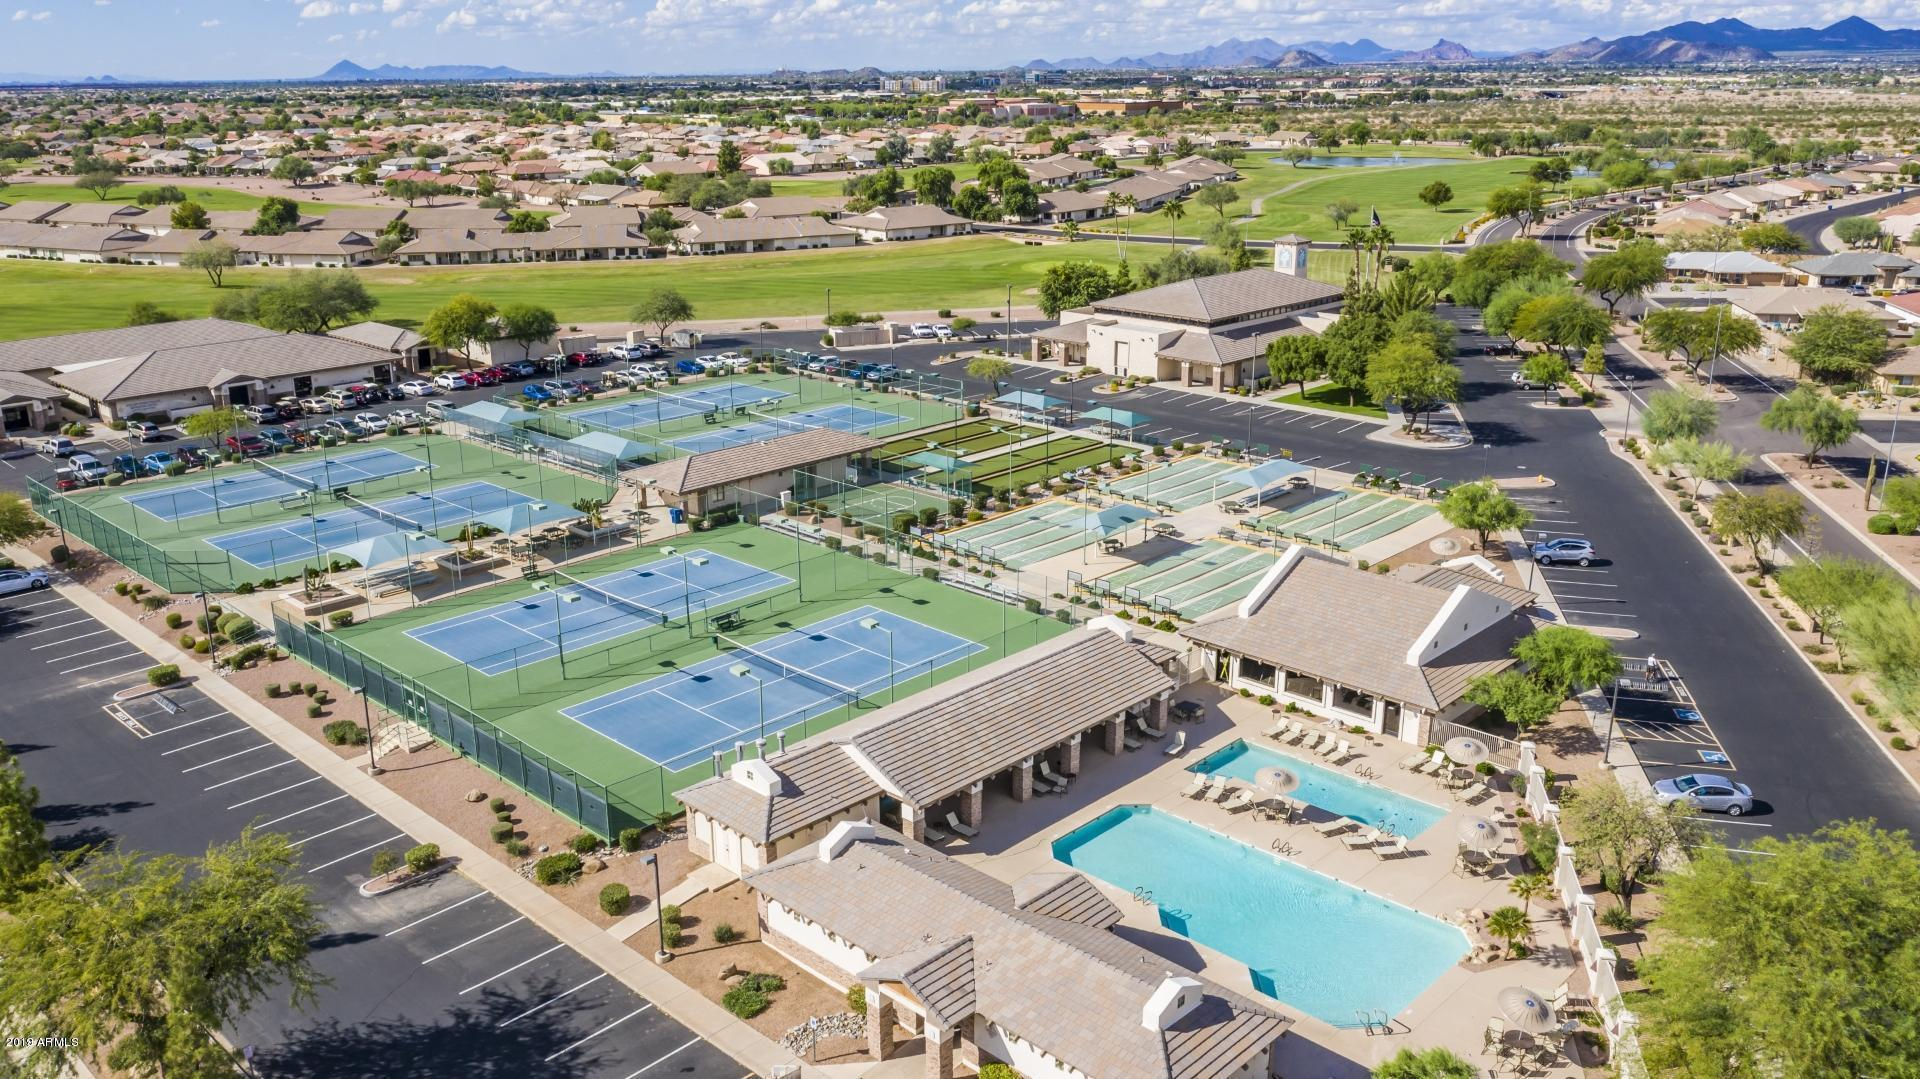 MLS 5896089 2234 S YELLOW WOOD --, Mesa, AZ 85209 Mesa AZ Sunland Springs Village